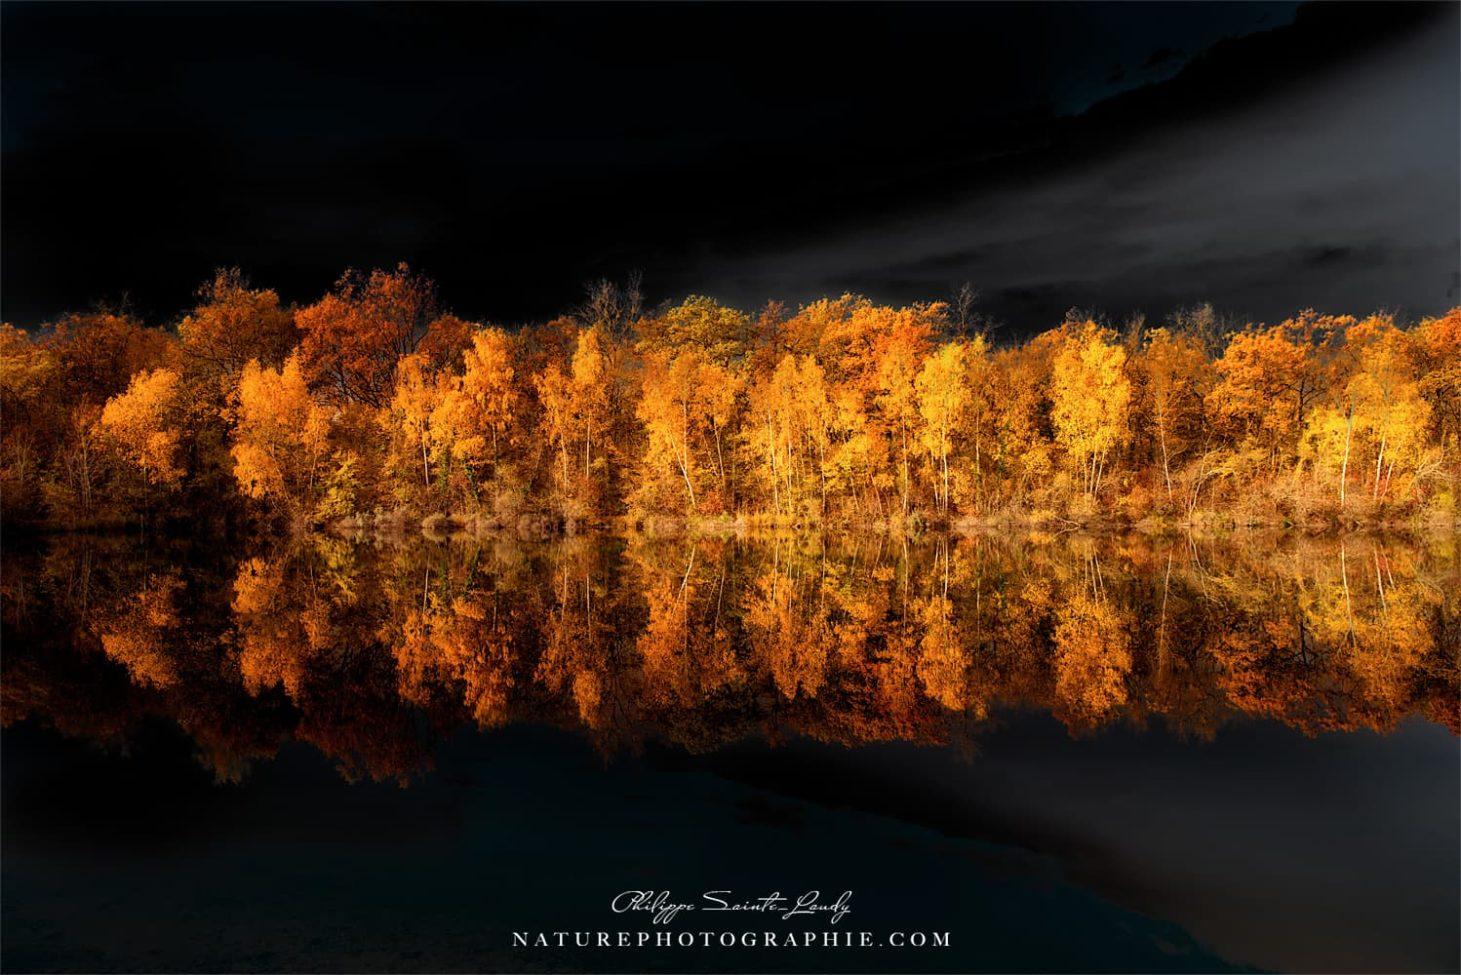 Black Sky in Autumn